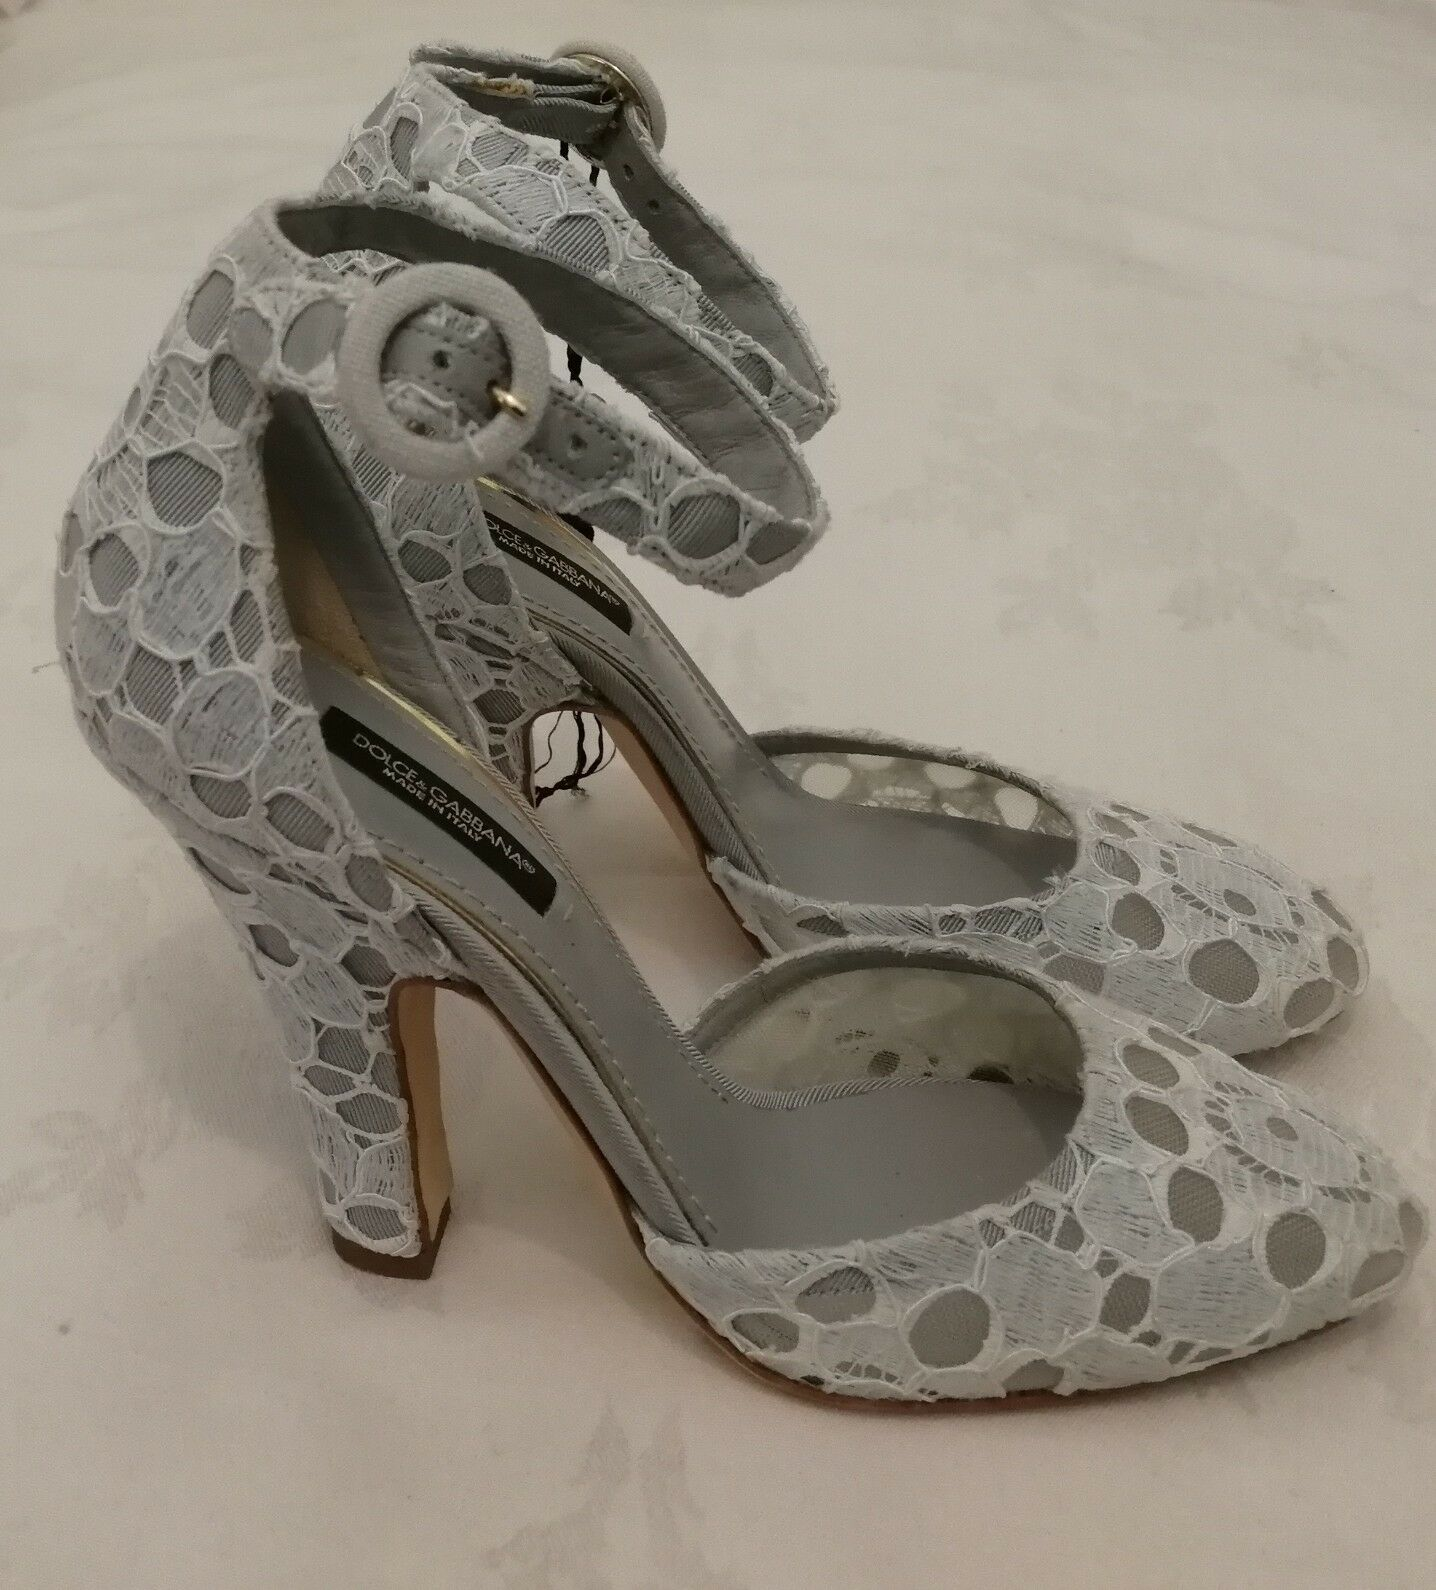 Dolce & Lace Gabbana High Heels Embellished Lace & Ankle Strap Damenschuhe Schuhes Grau eu 36 02507c